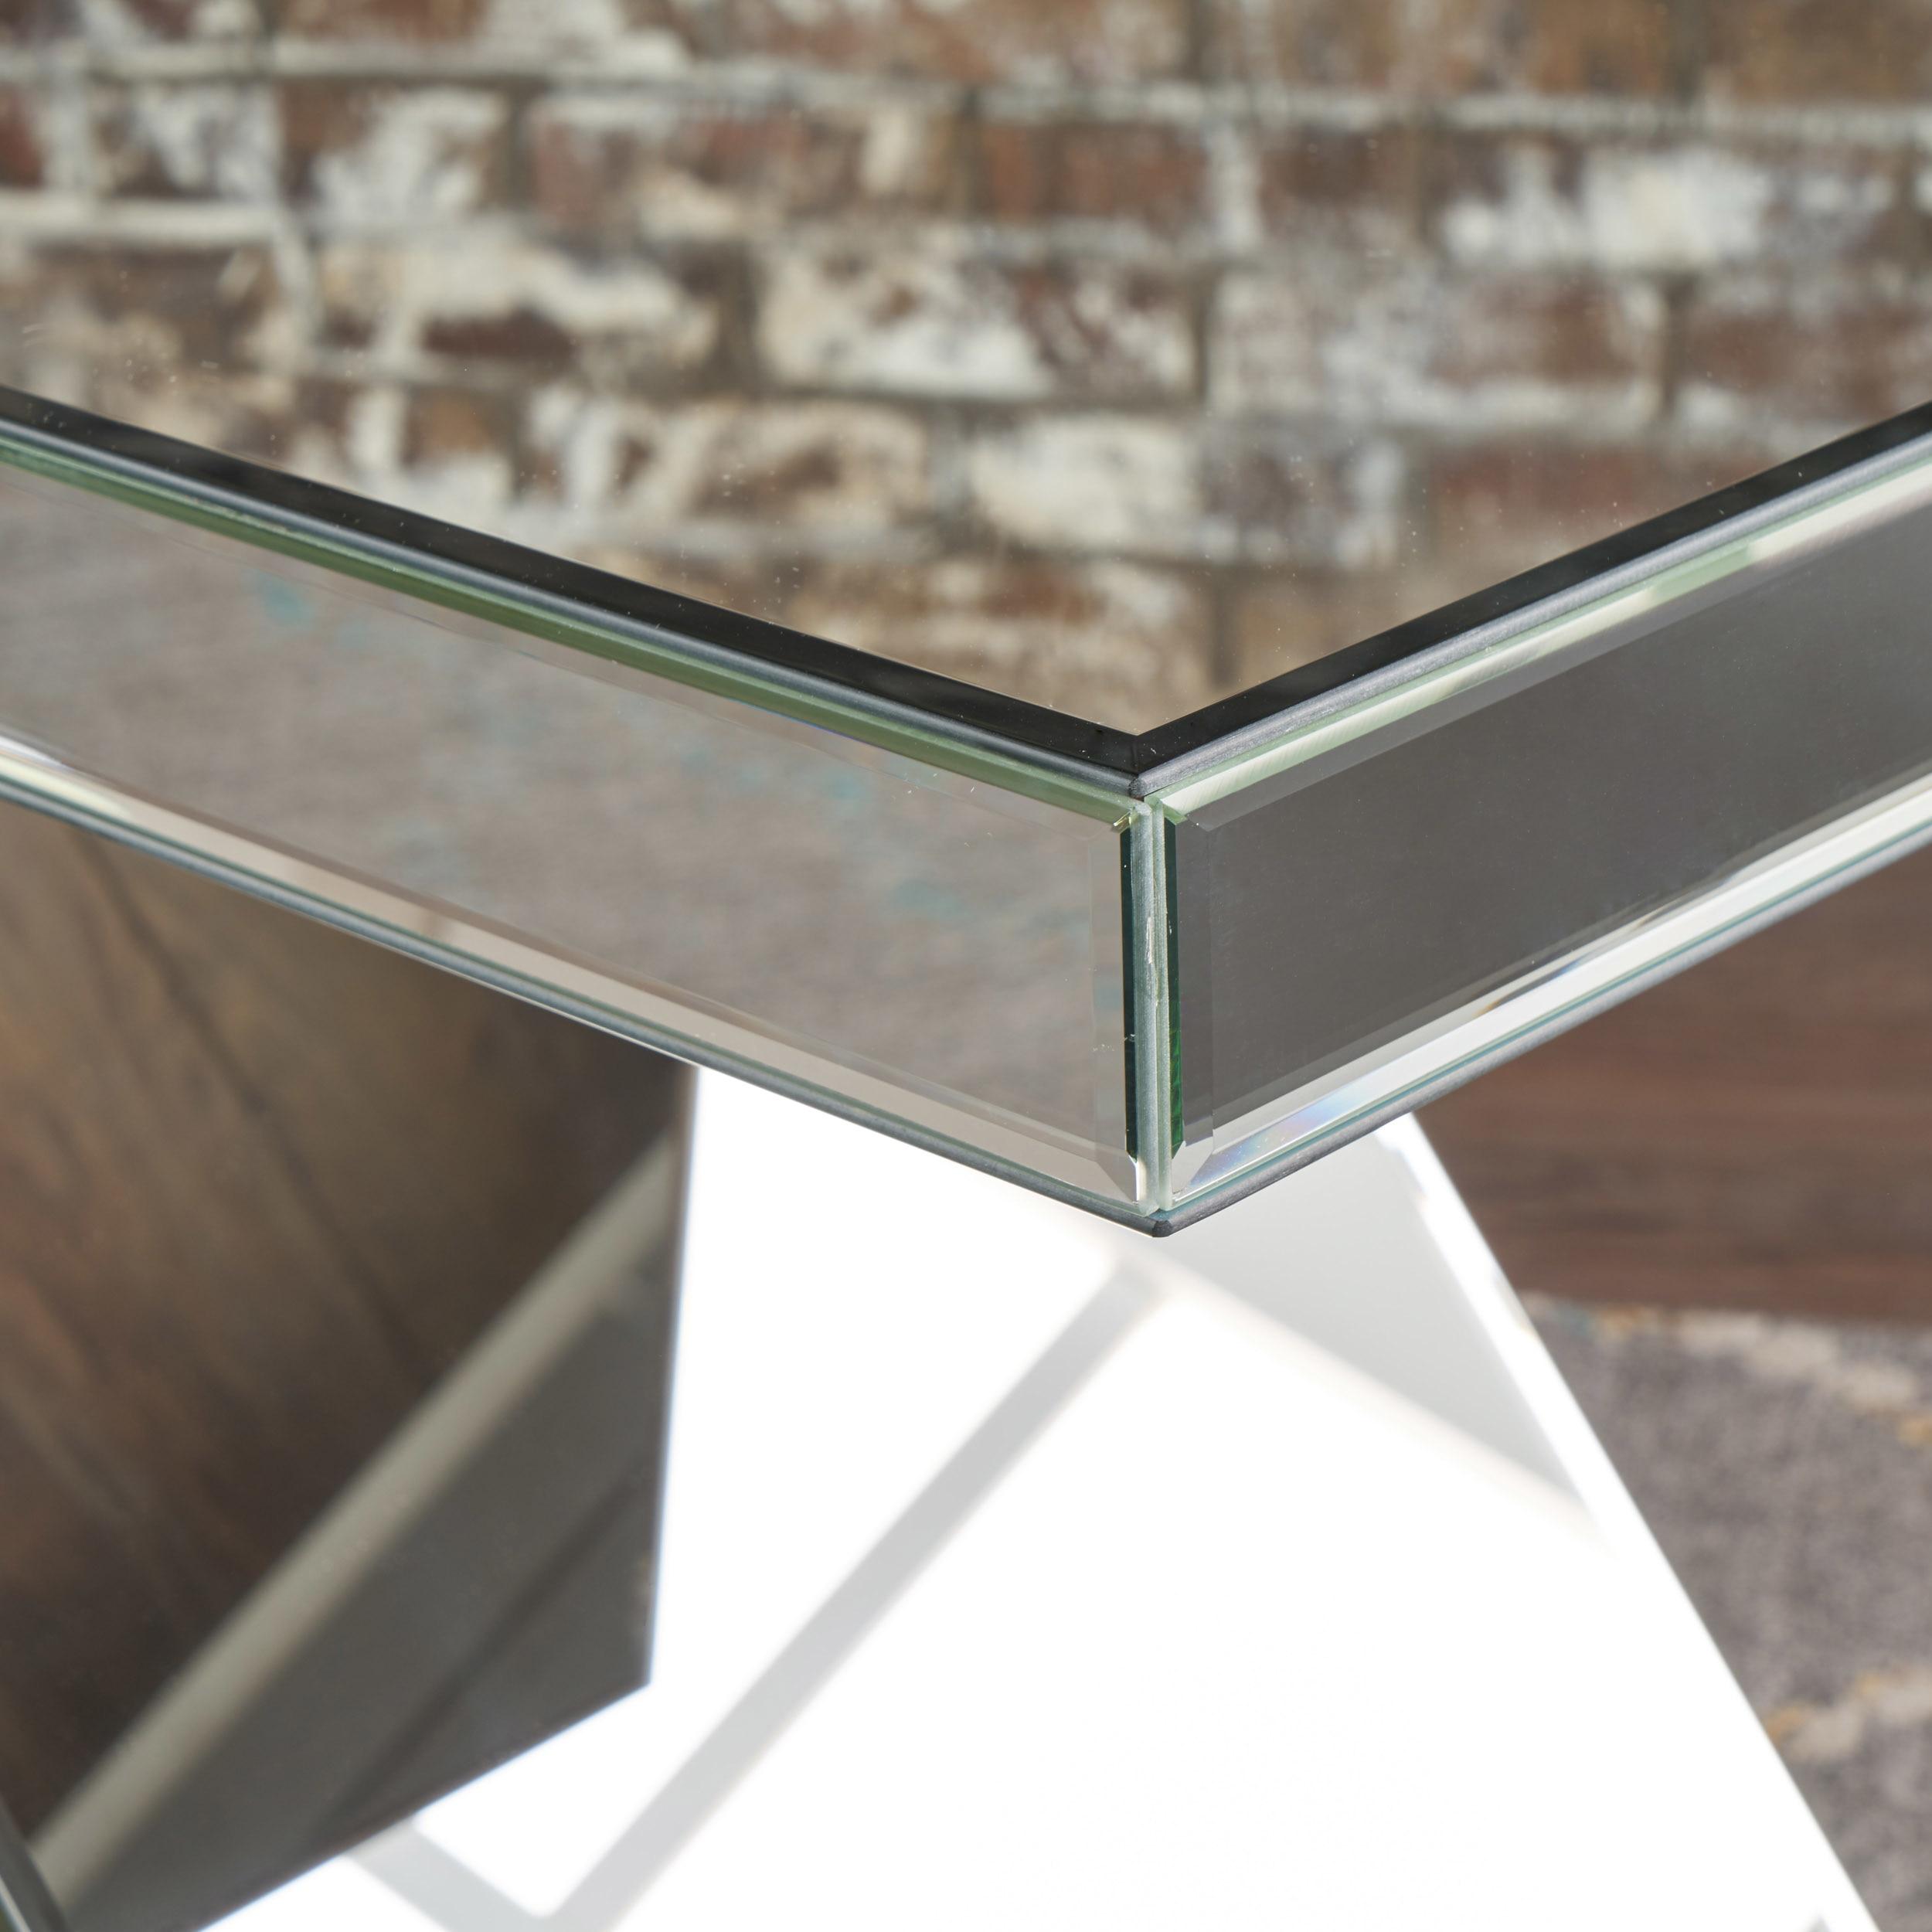 Adu Mirrored Z Shaped Side Table (1)